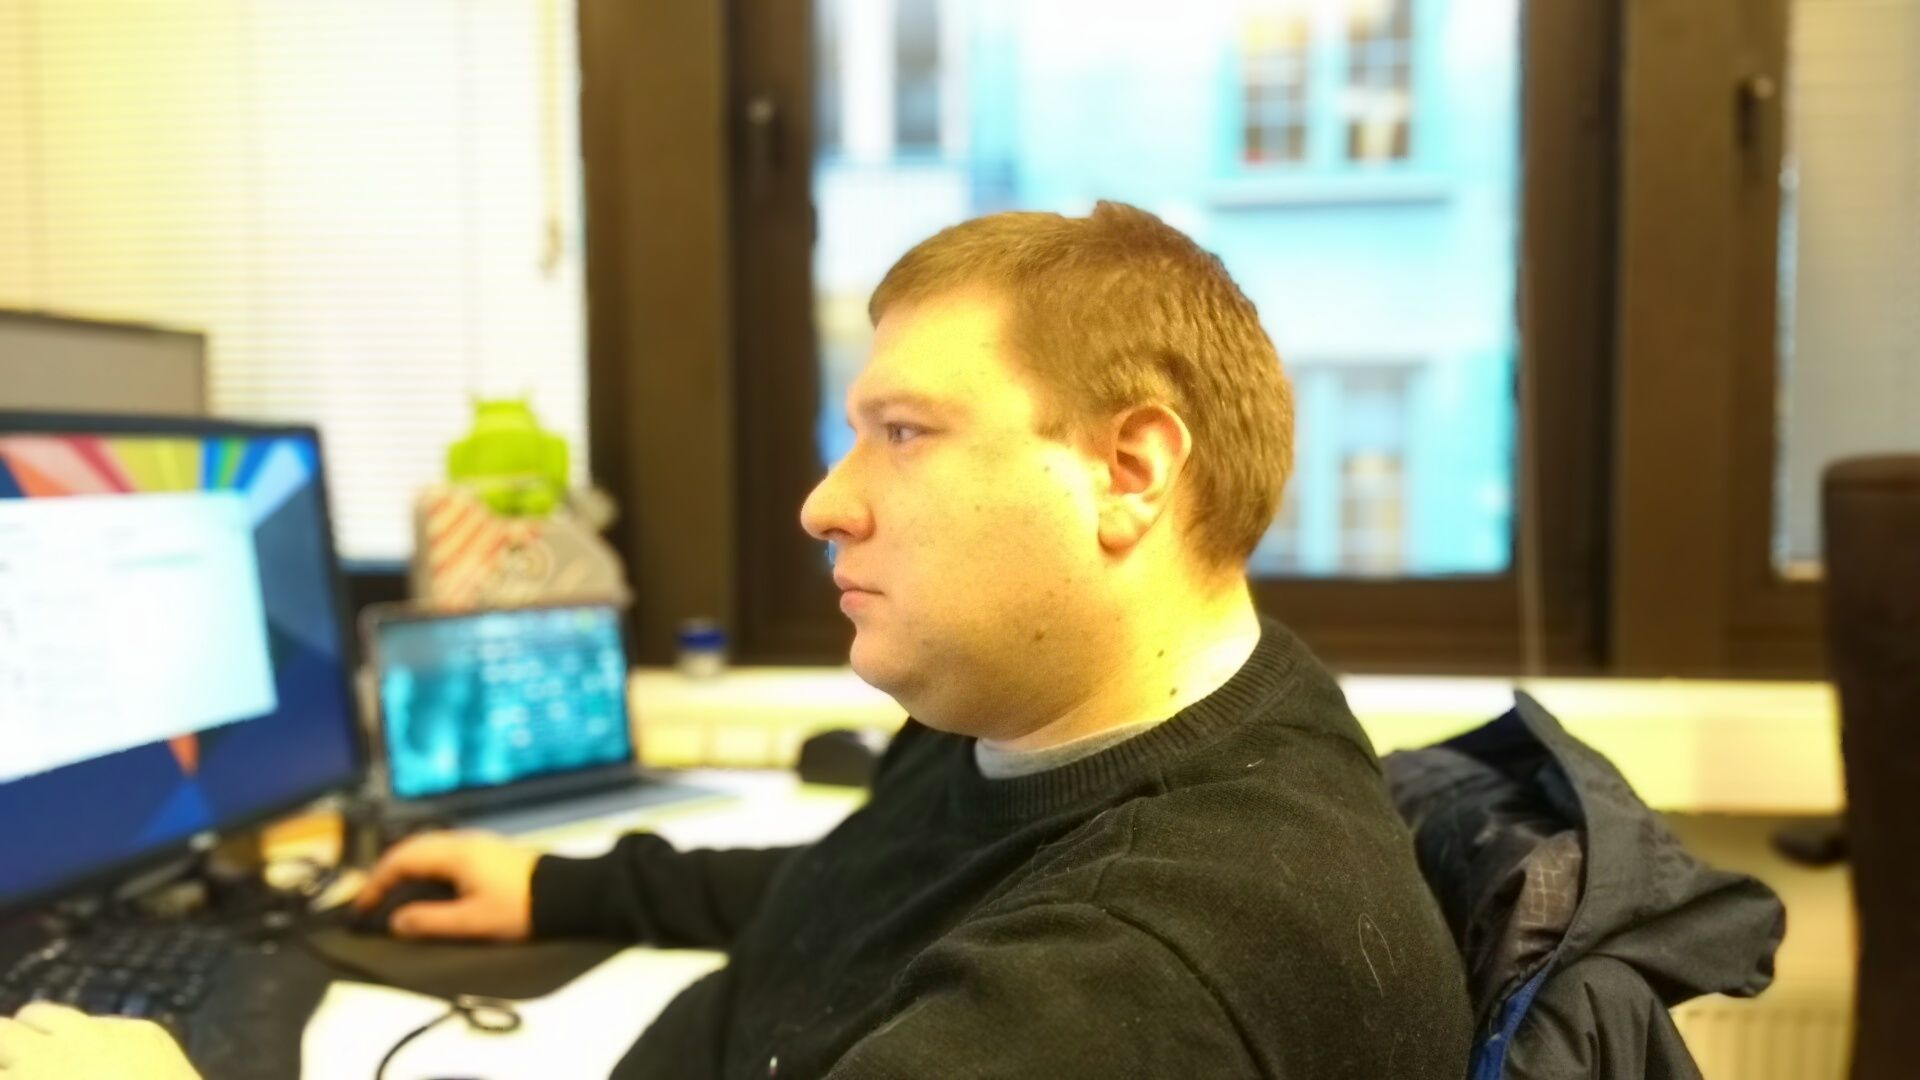 Kollega Kvalheim ser om mulig ekstra usunn ut når vi tar bilde av ham med Nexus 9.